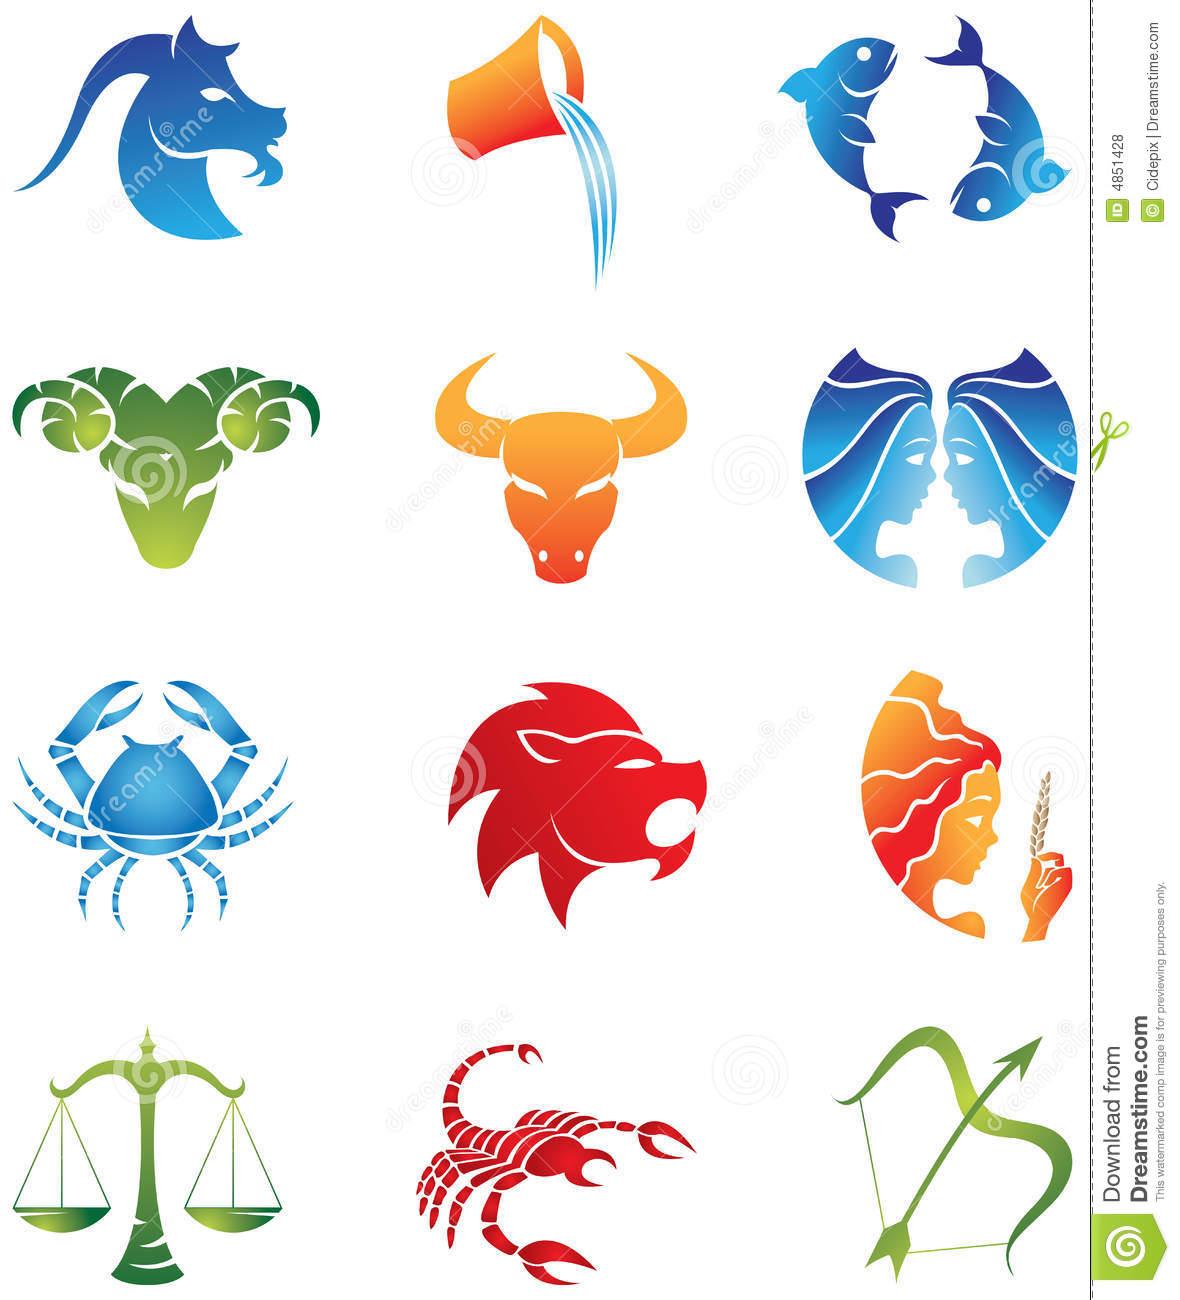 Zodiac clipart astrological sign Clipart Star sign Clipground Zodiac